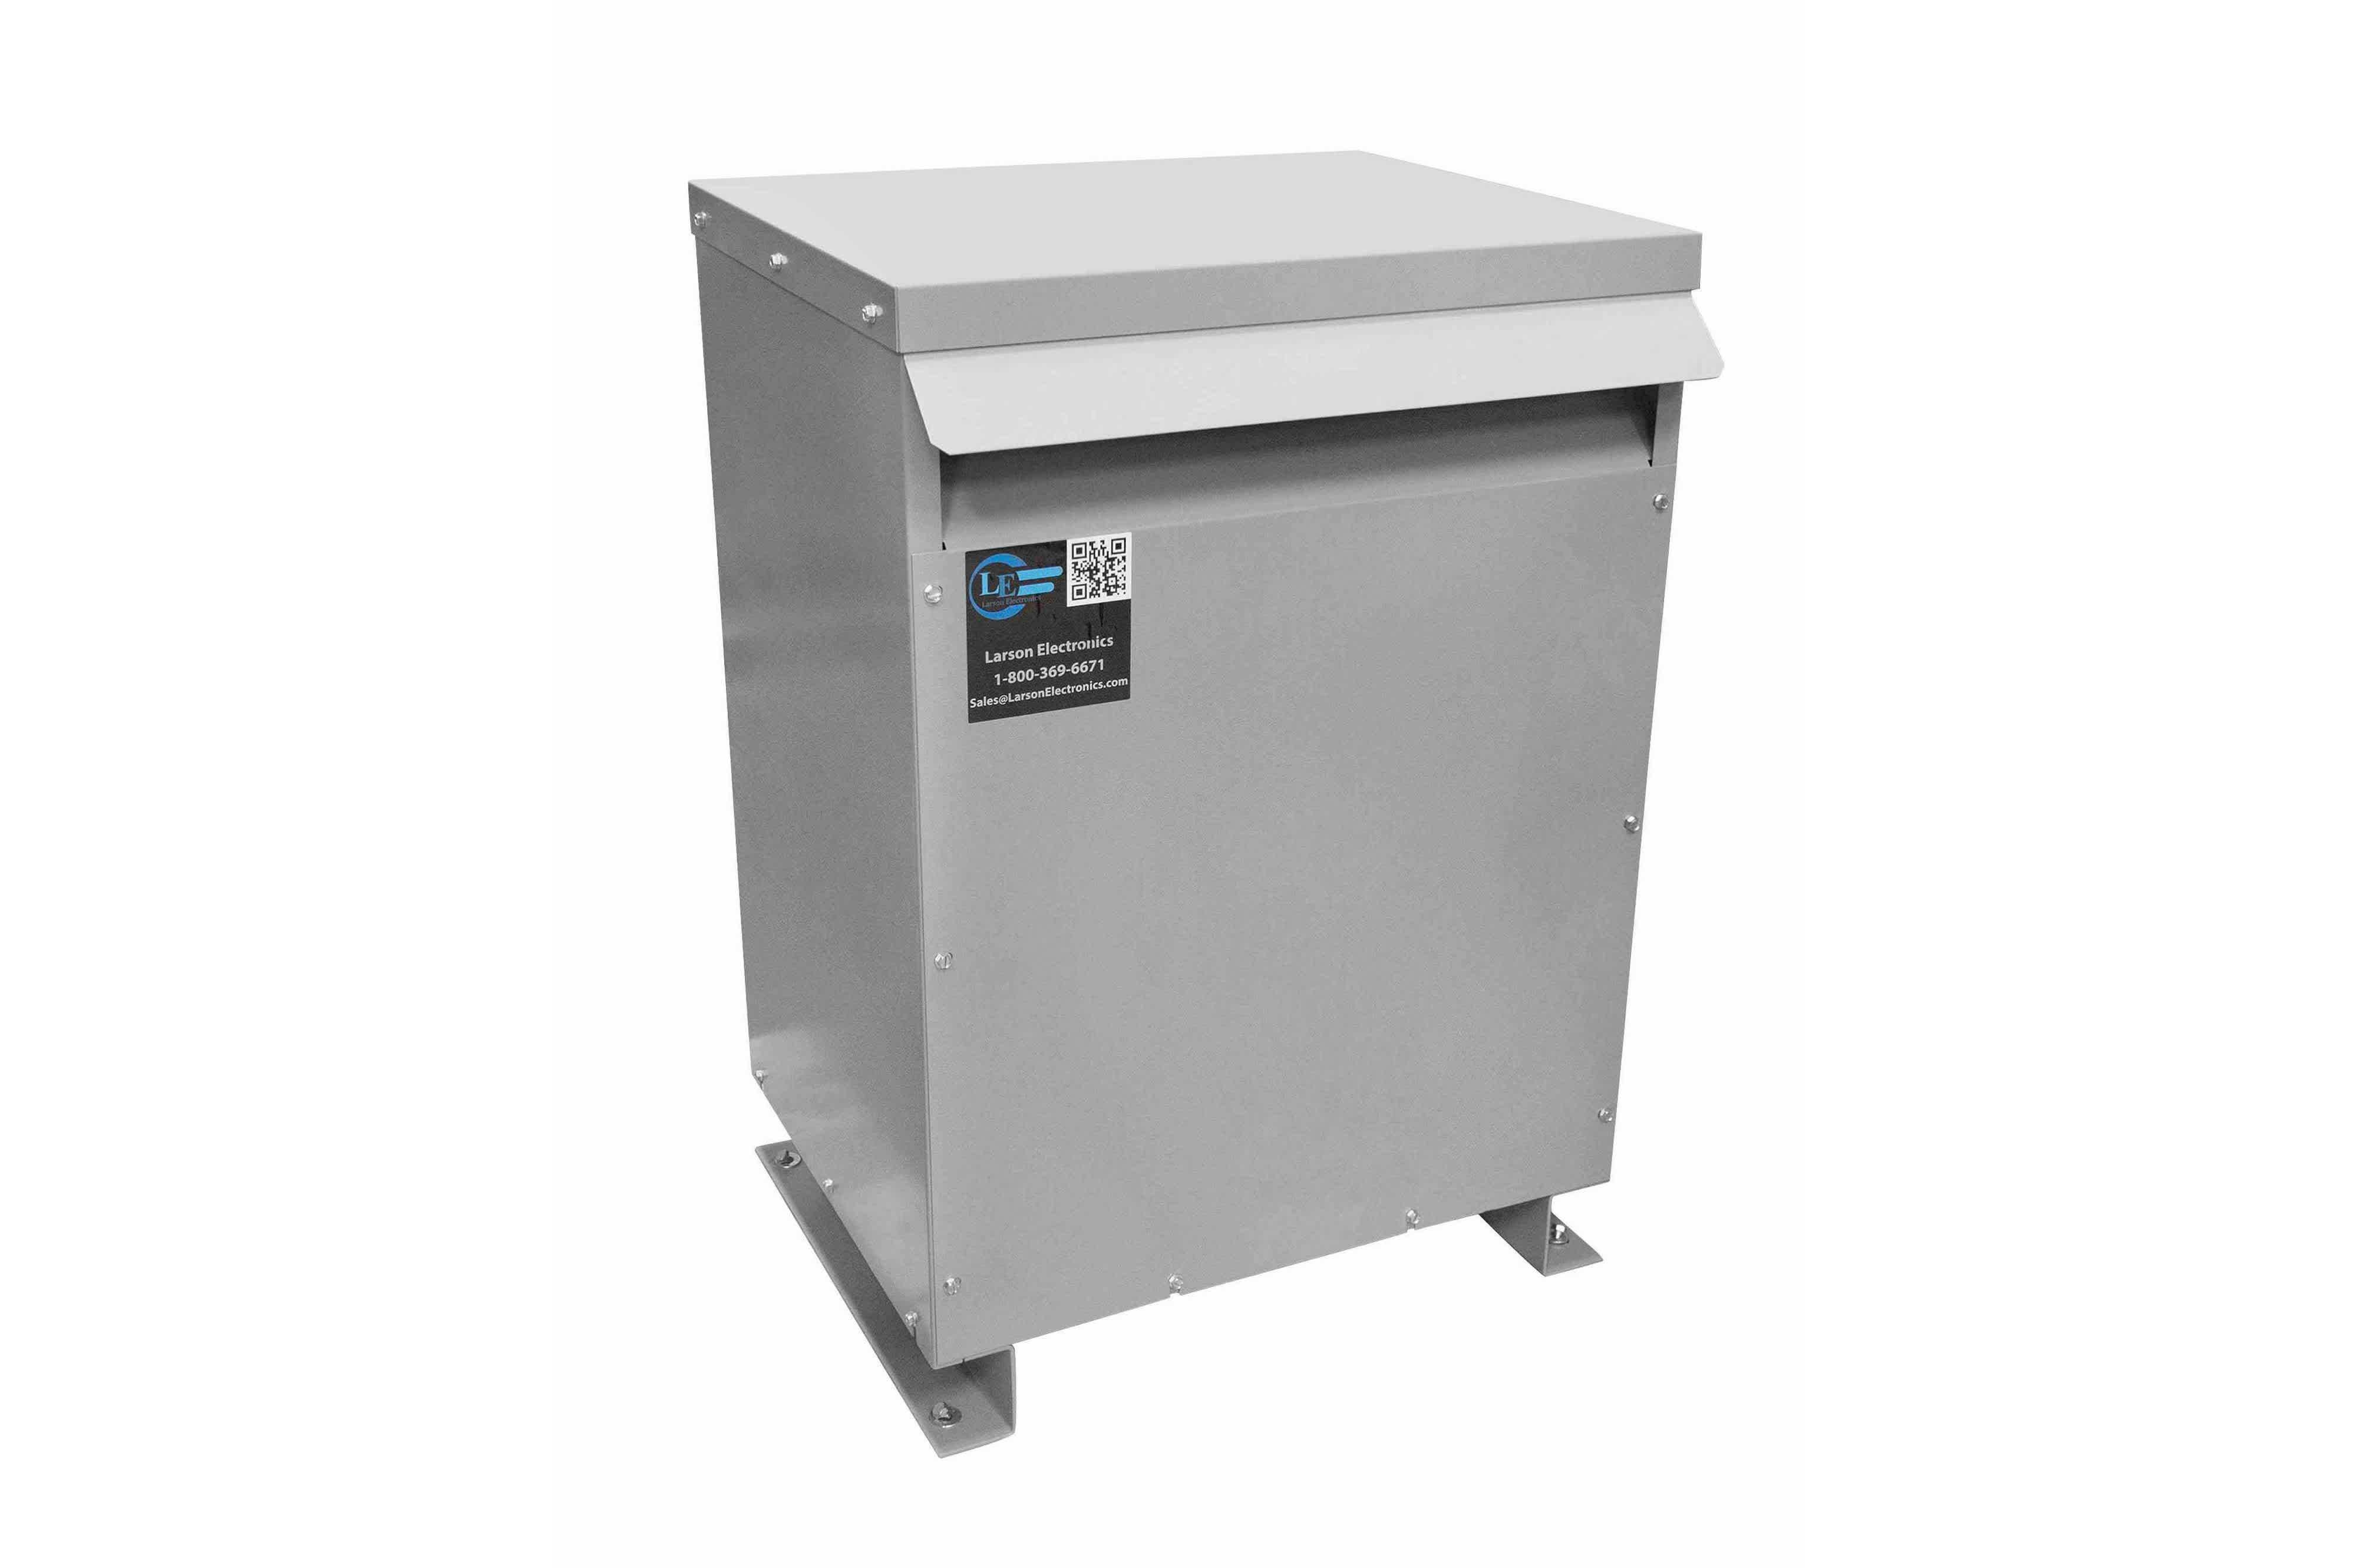 300 kVA 3PH Isolation Transformer, 480V Wye Primary, 208V Delta Secondary, N3R, Ventilated, 60 Hz